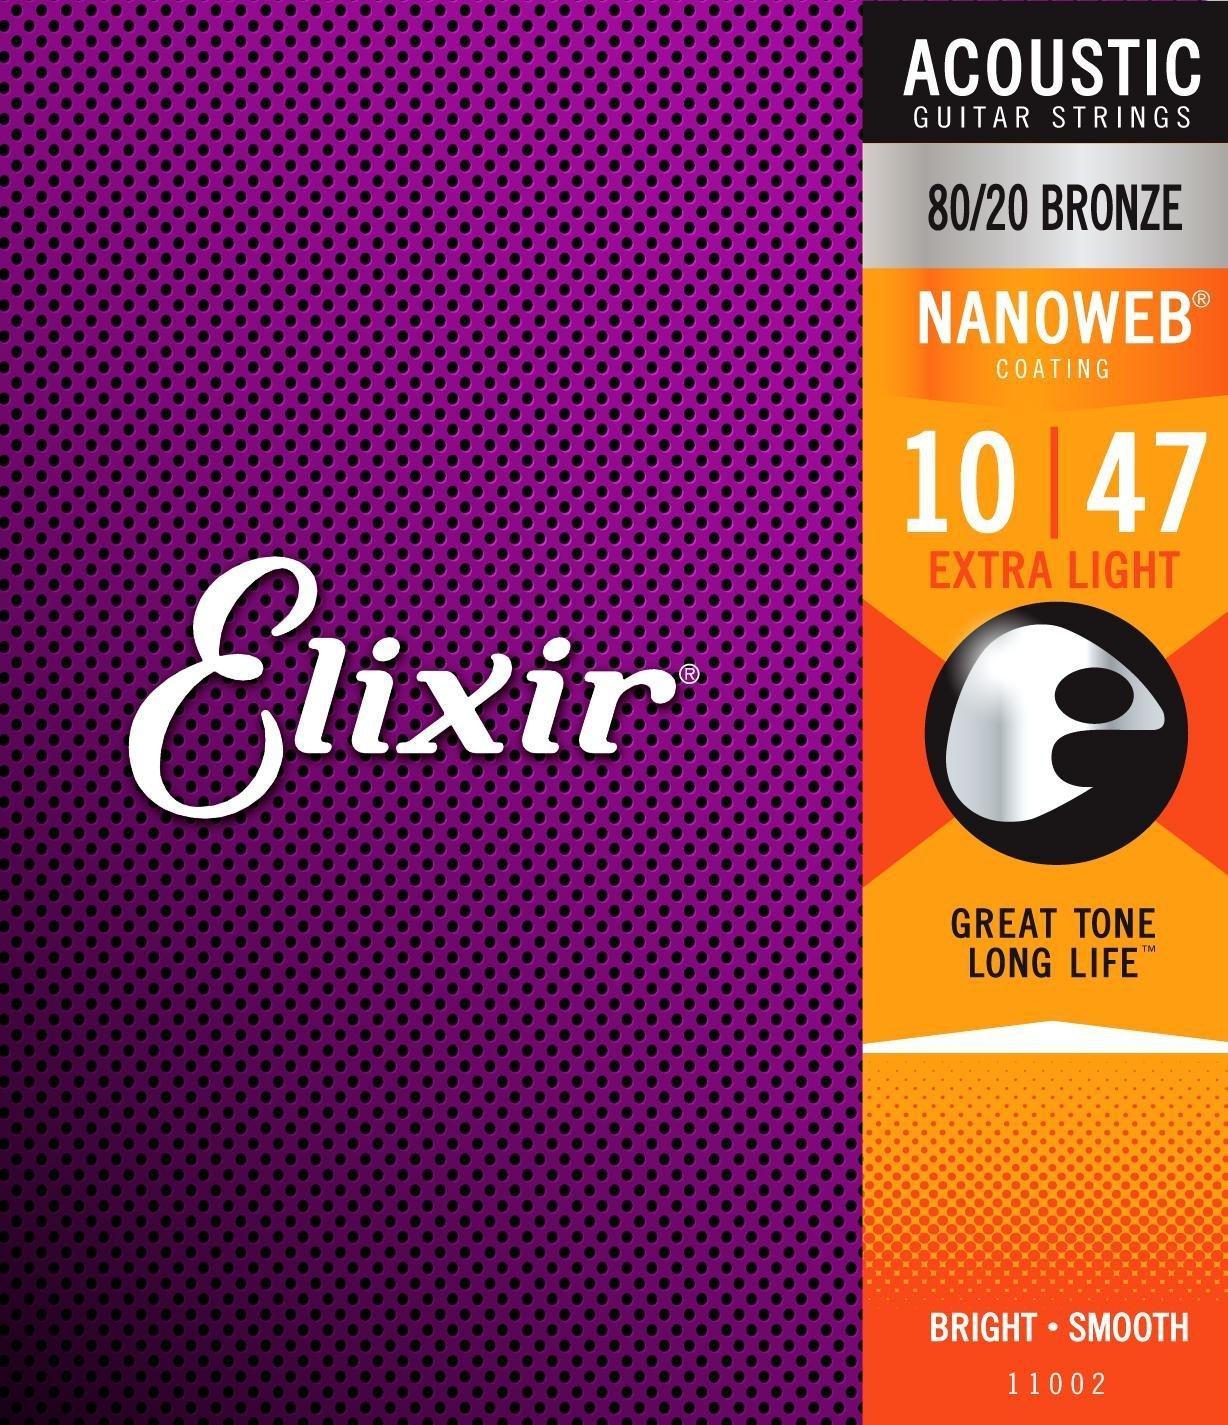 11002 ELIXIR NANO EXTRA LIGHT